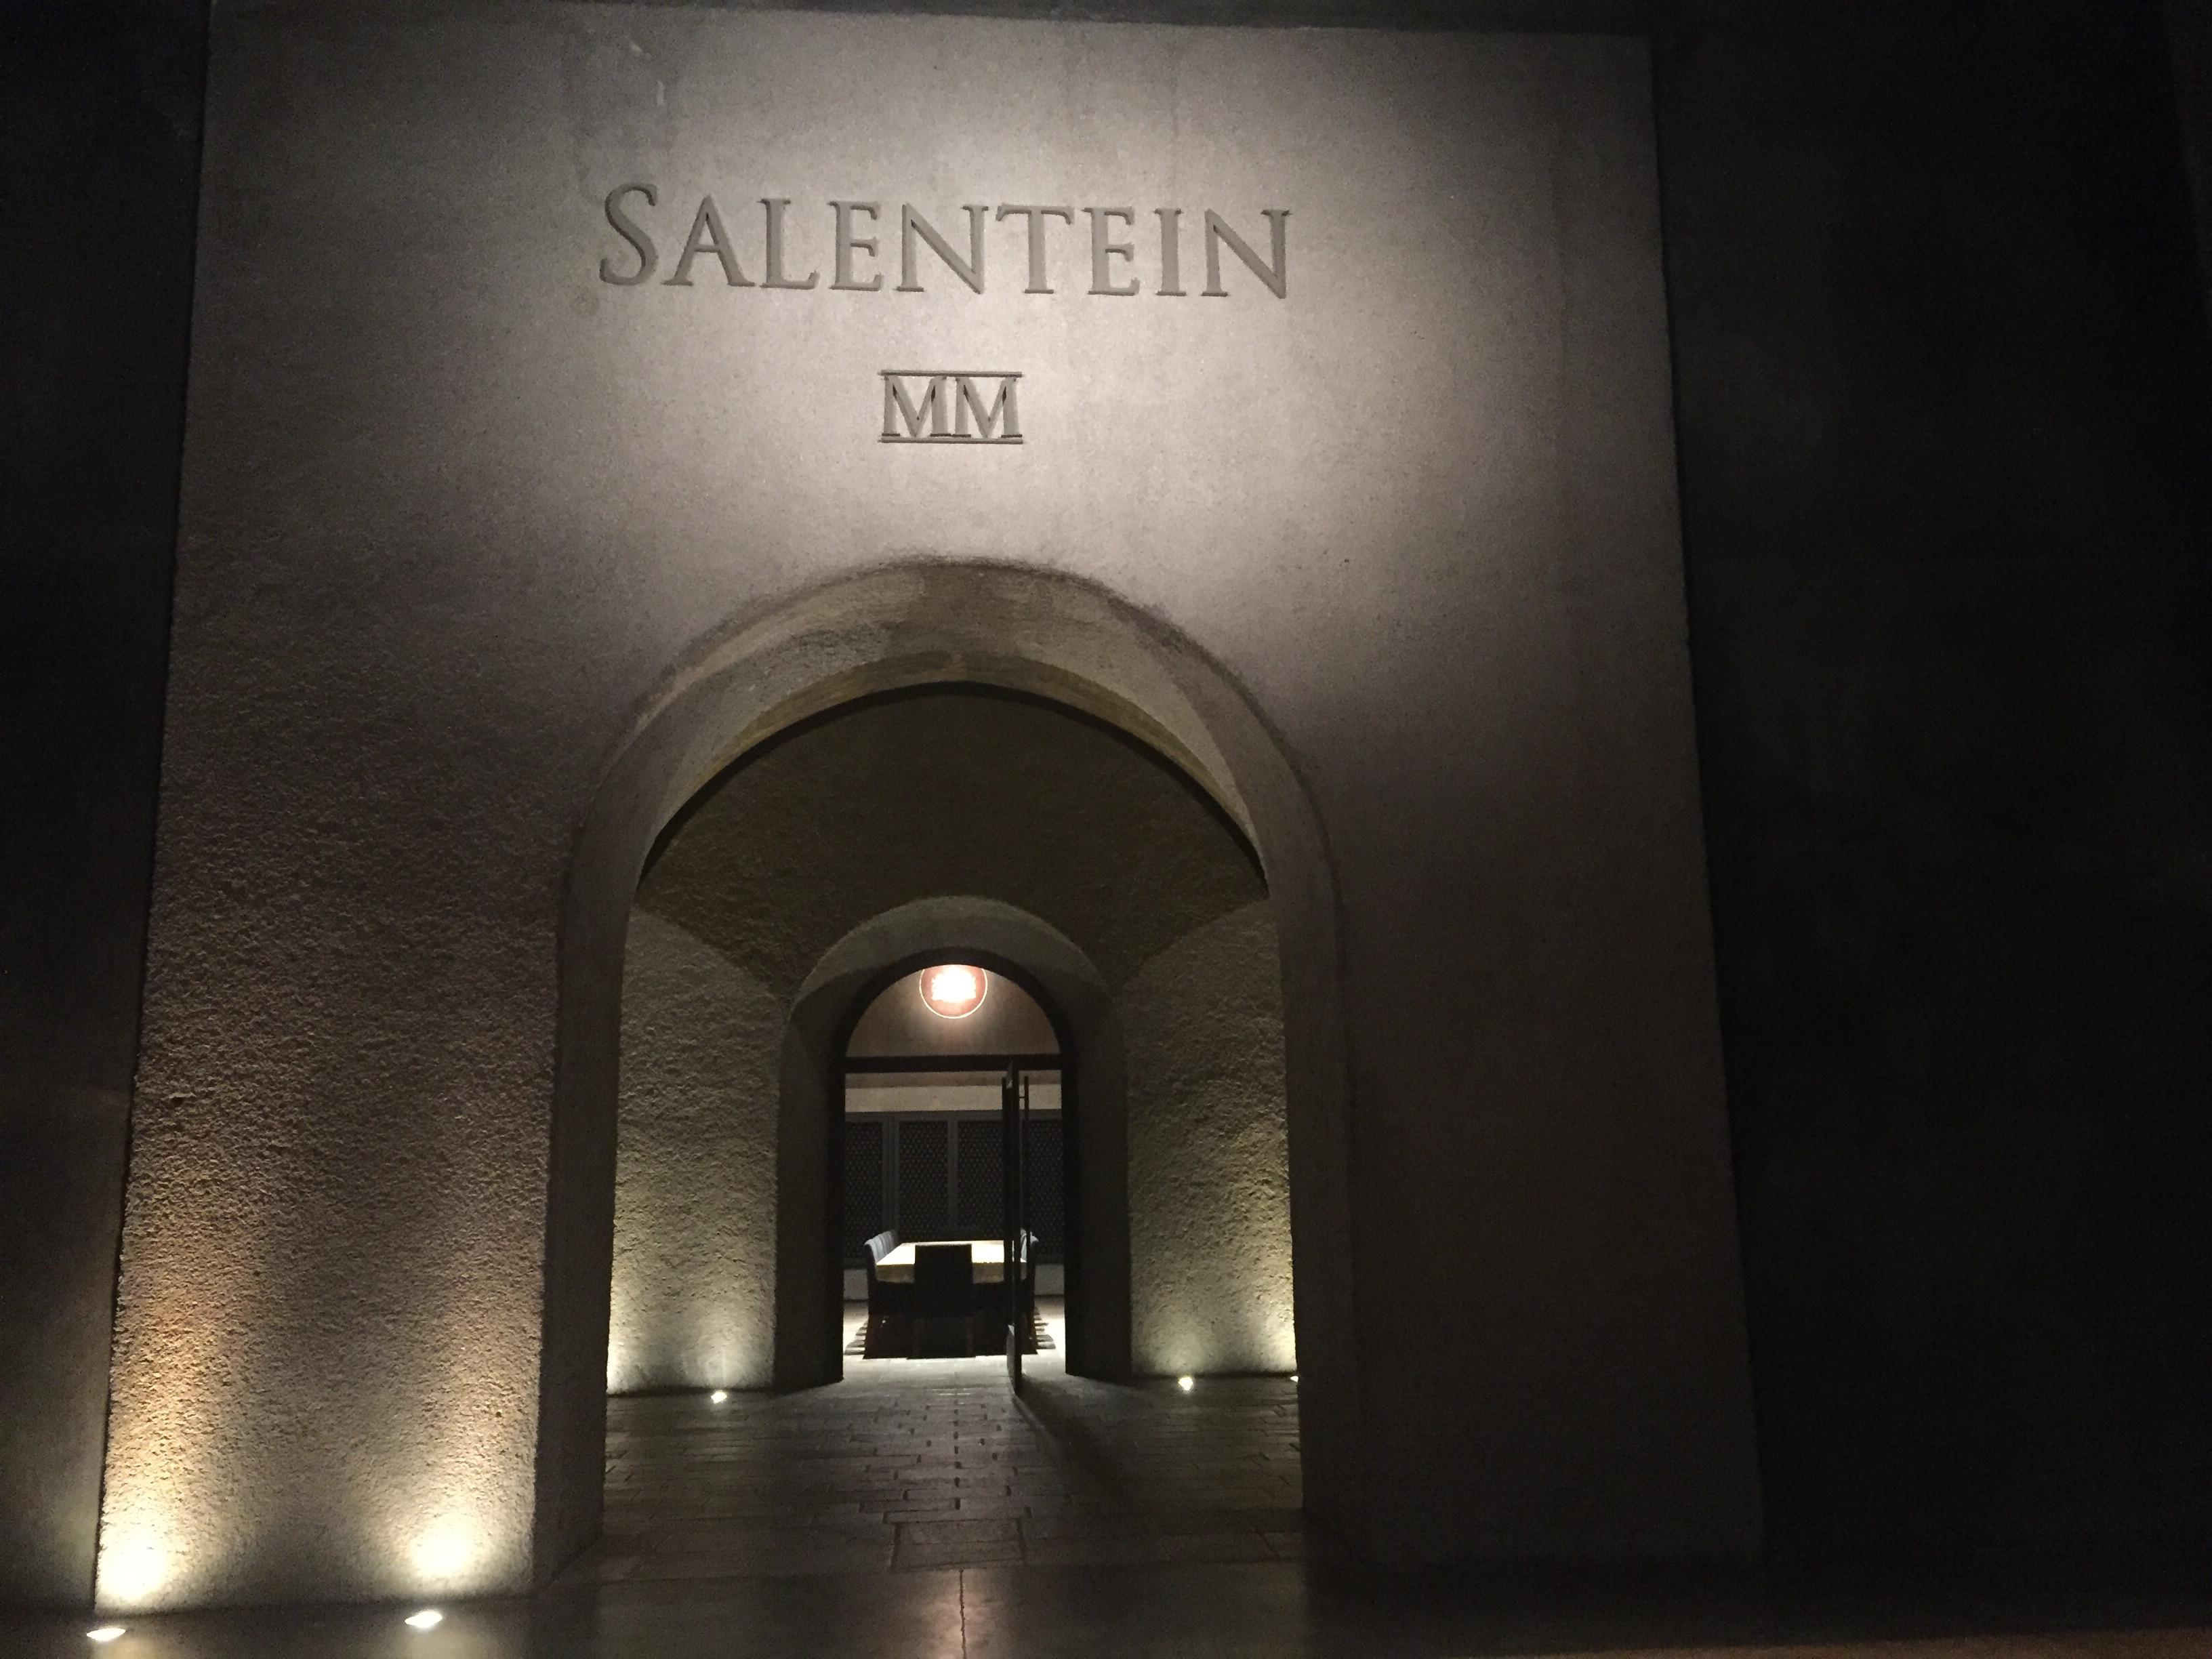 img 8883 - Paseando por la Bodega Salentein en Mendoza